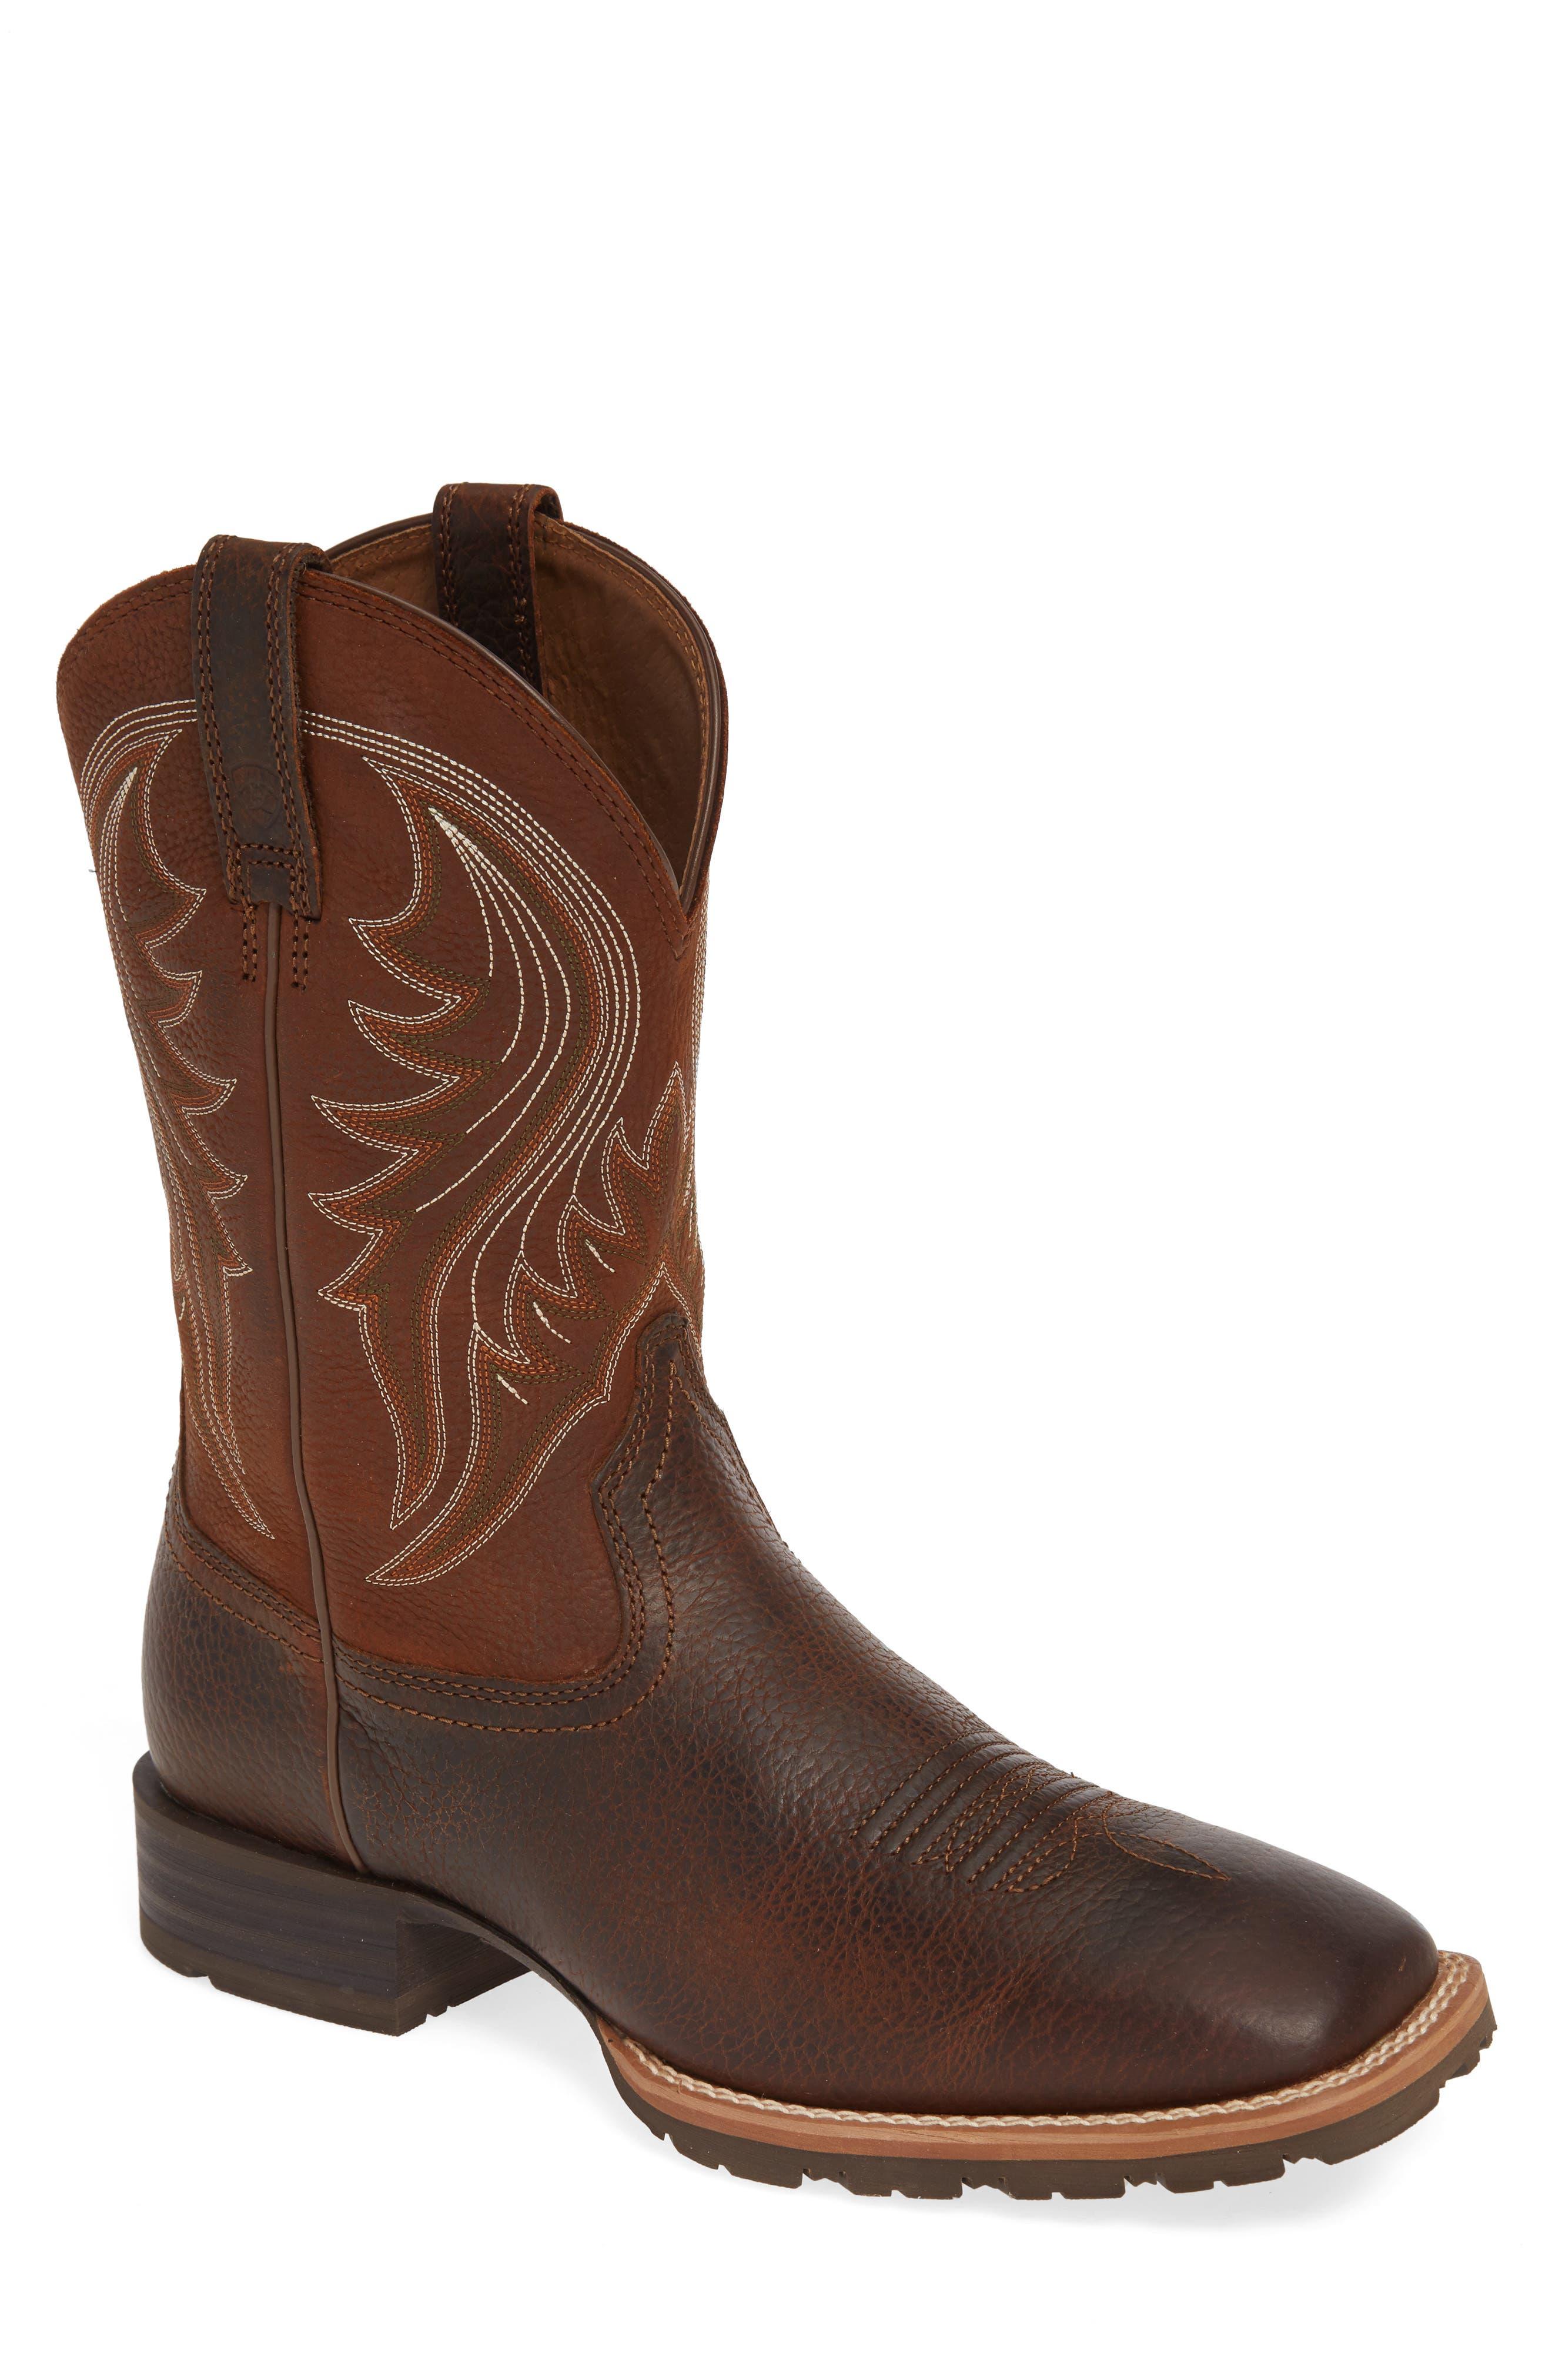 Ariat Hybrid Rancher Cowboy Boot, Brown